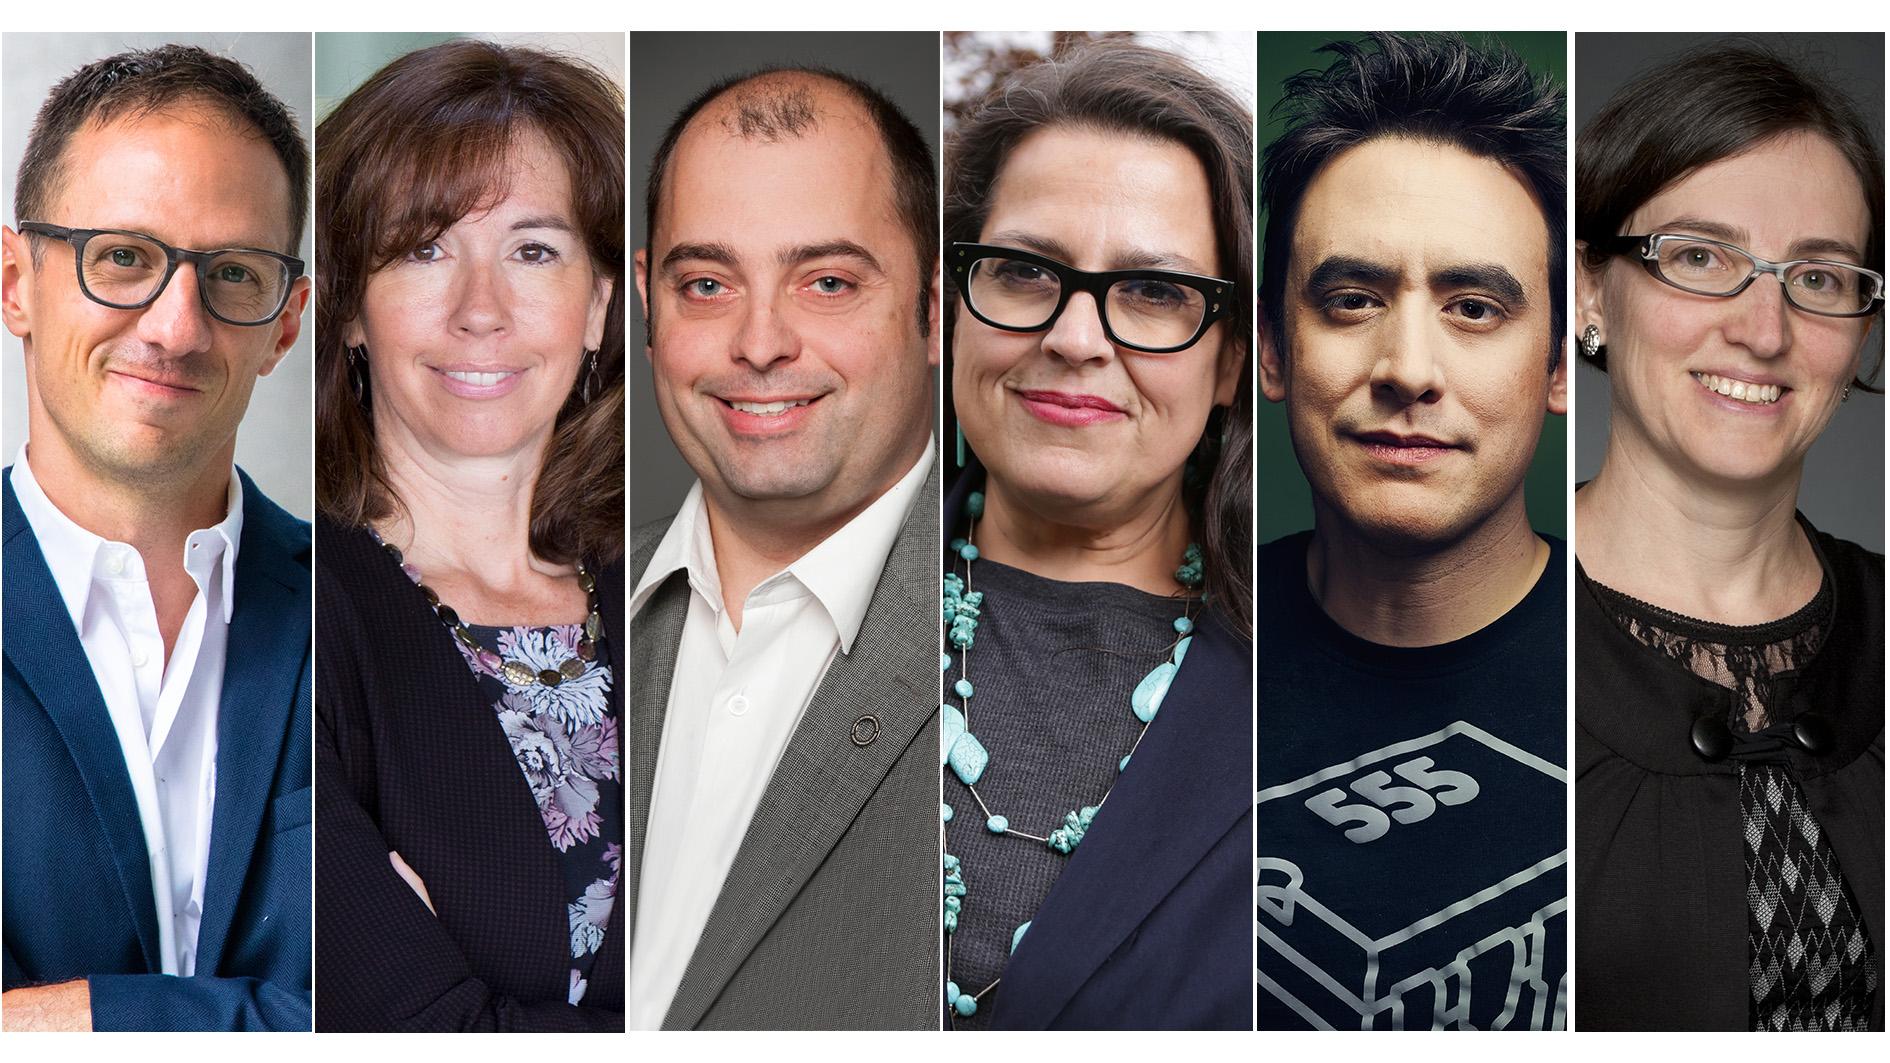 Pascal Audet, Nathalie Chalifour, Marc-André Langlois, Lindsey Lindberg, Andrew Pelling and Marie-Ève Sylvestre